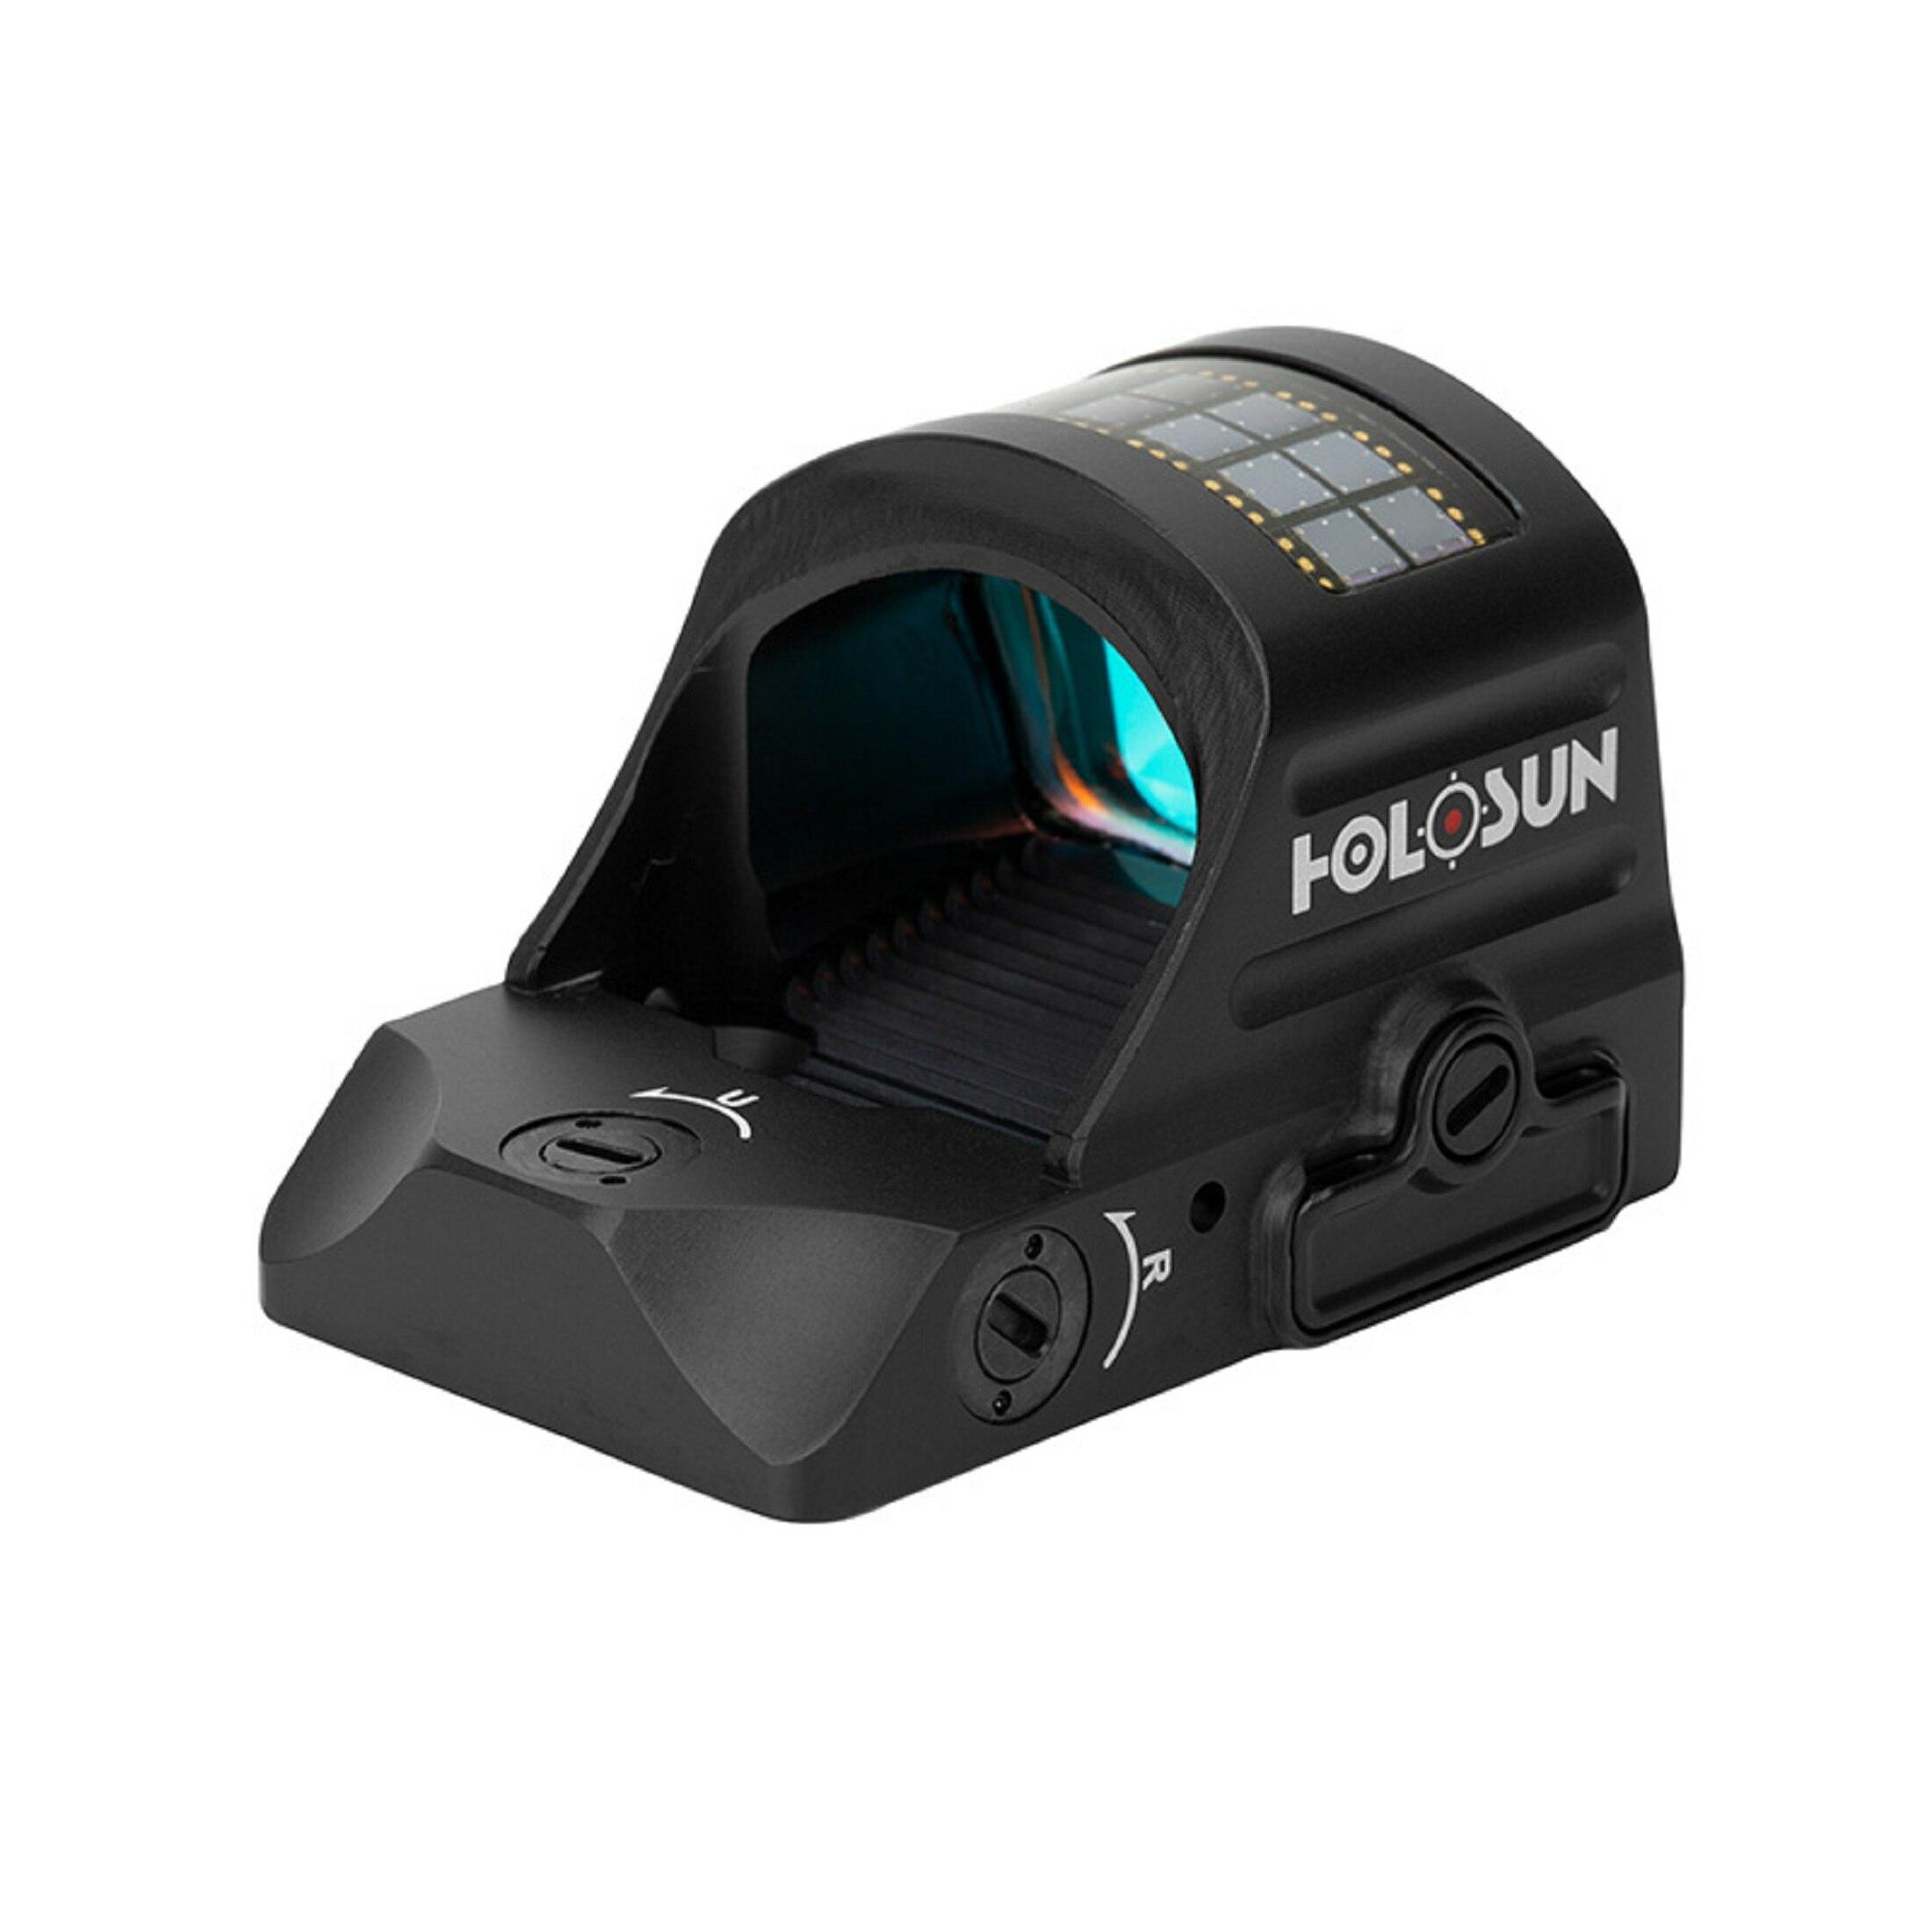 Holosun Dot Sight CLASSIC HS407C-X2